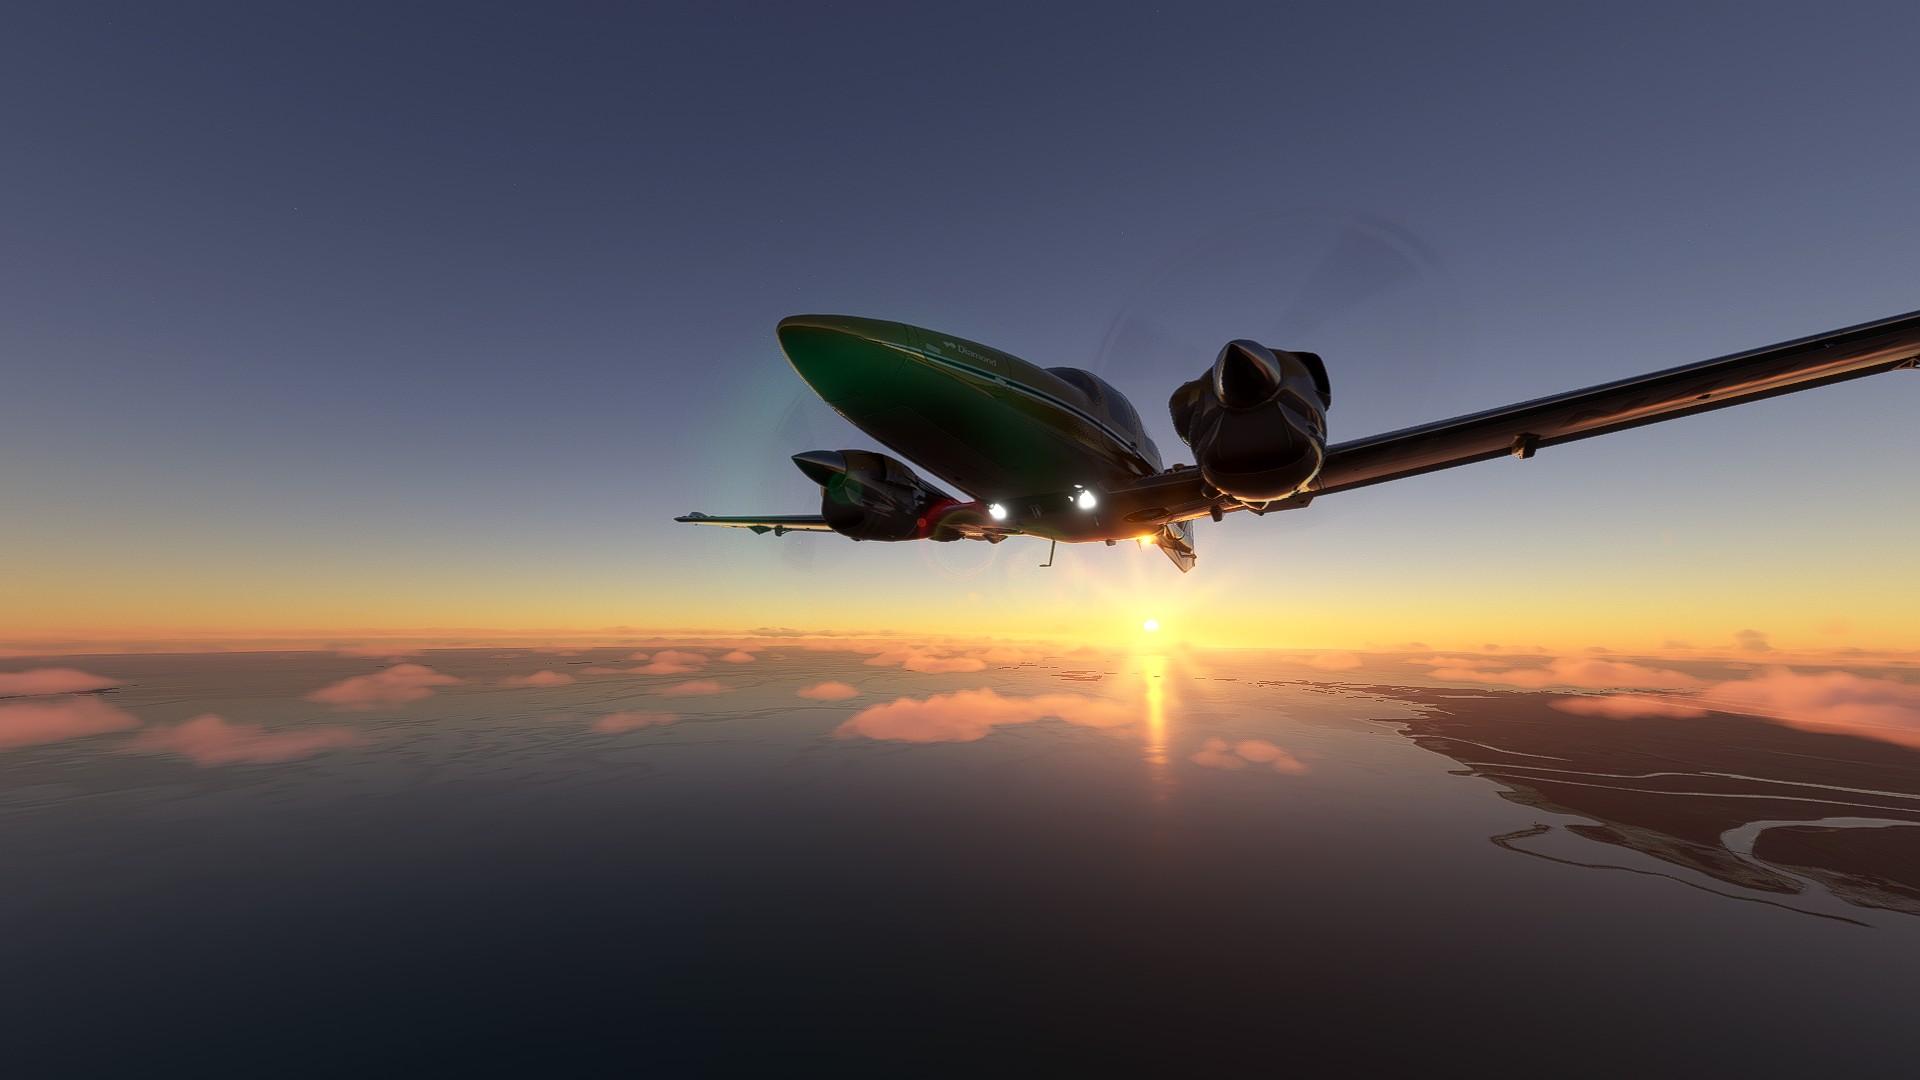 Microsoft Flight Simulator 5 1 2021 12 40 24 Pm